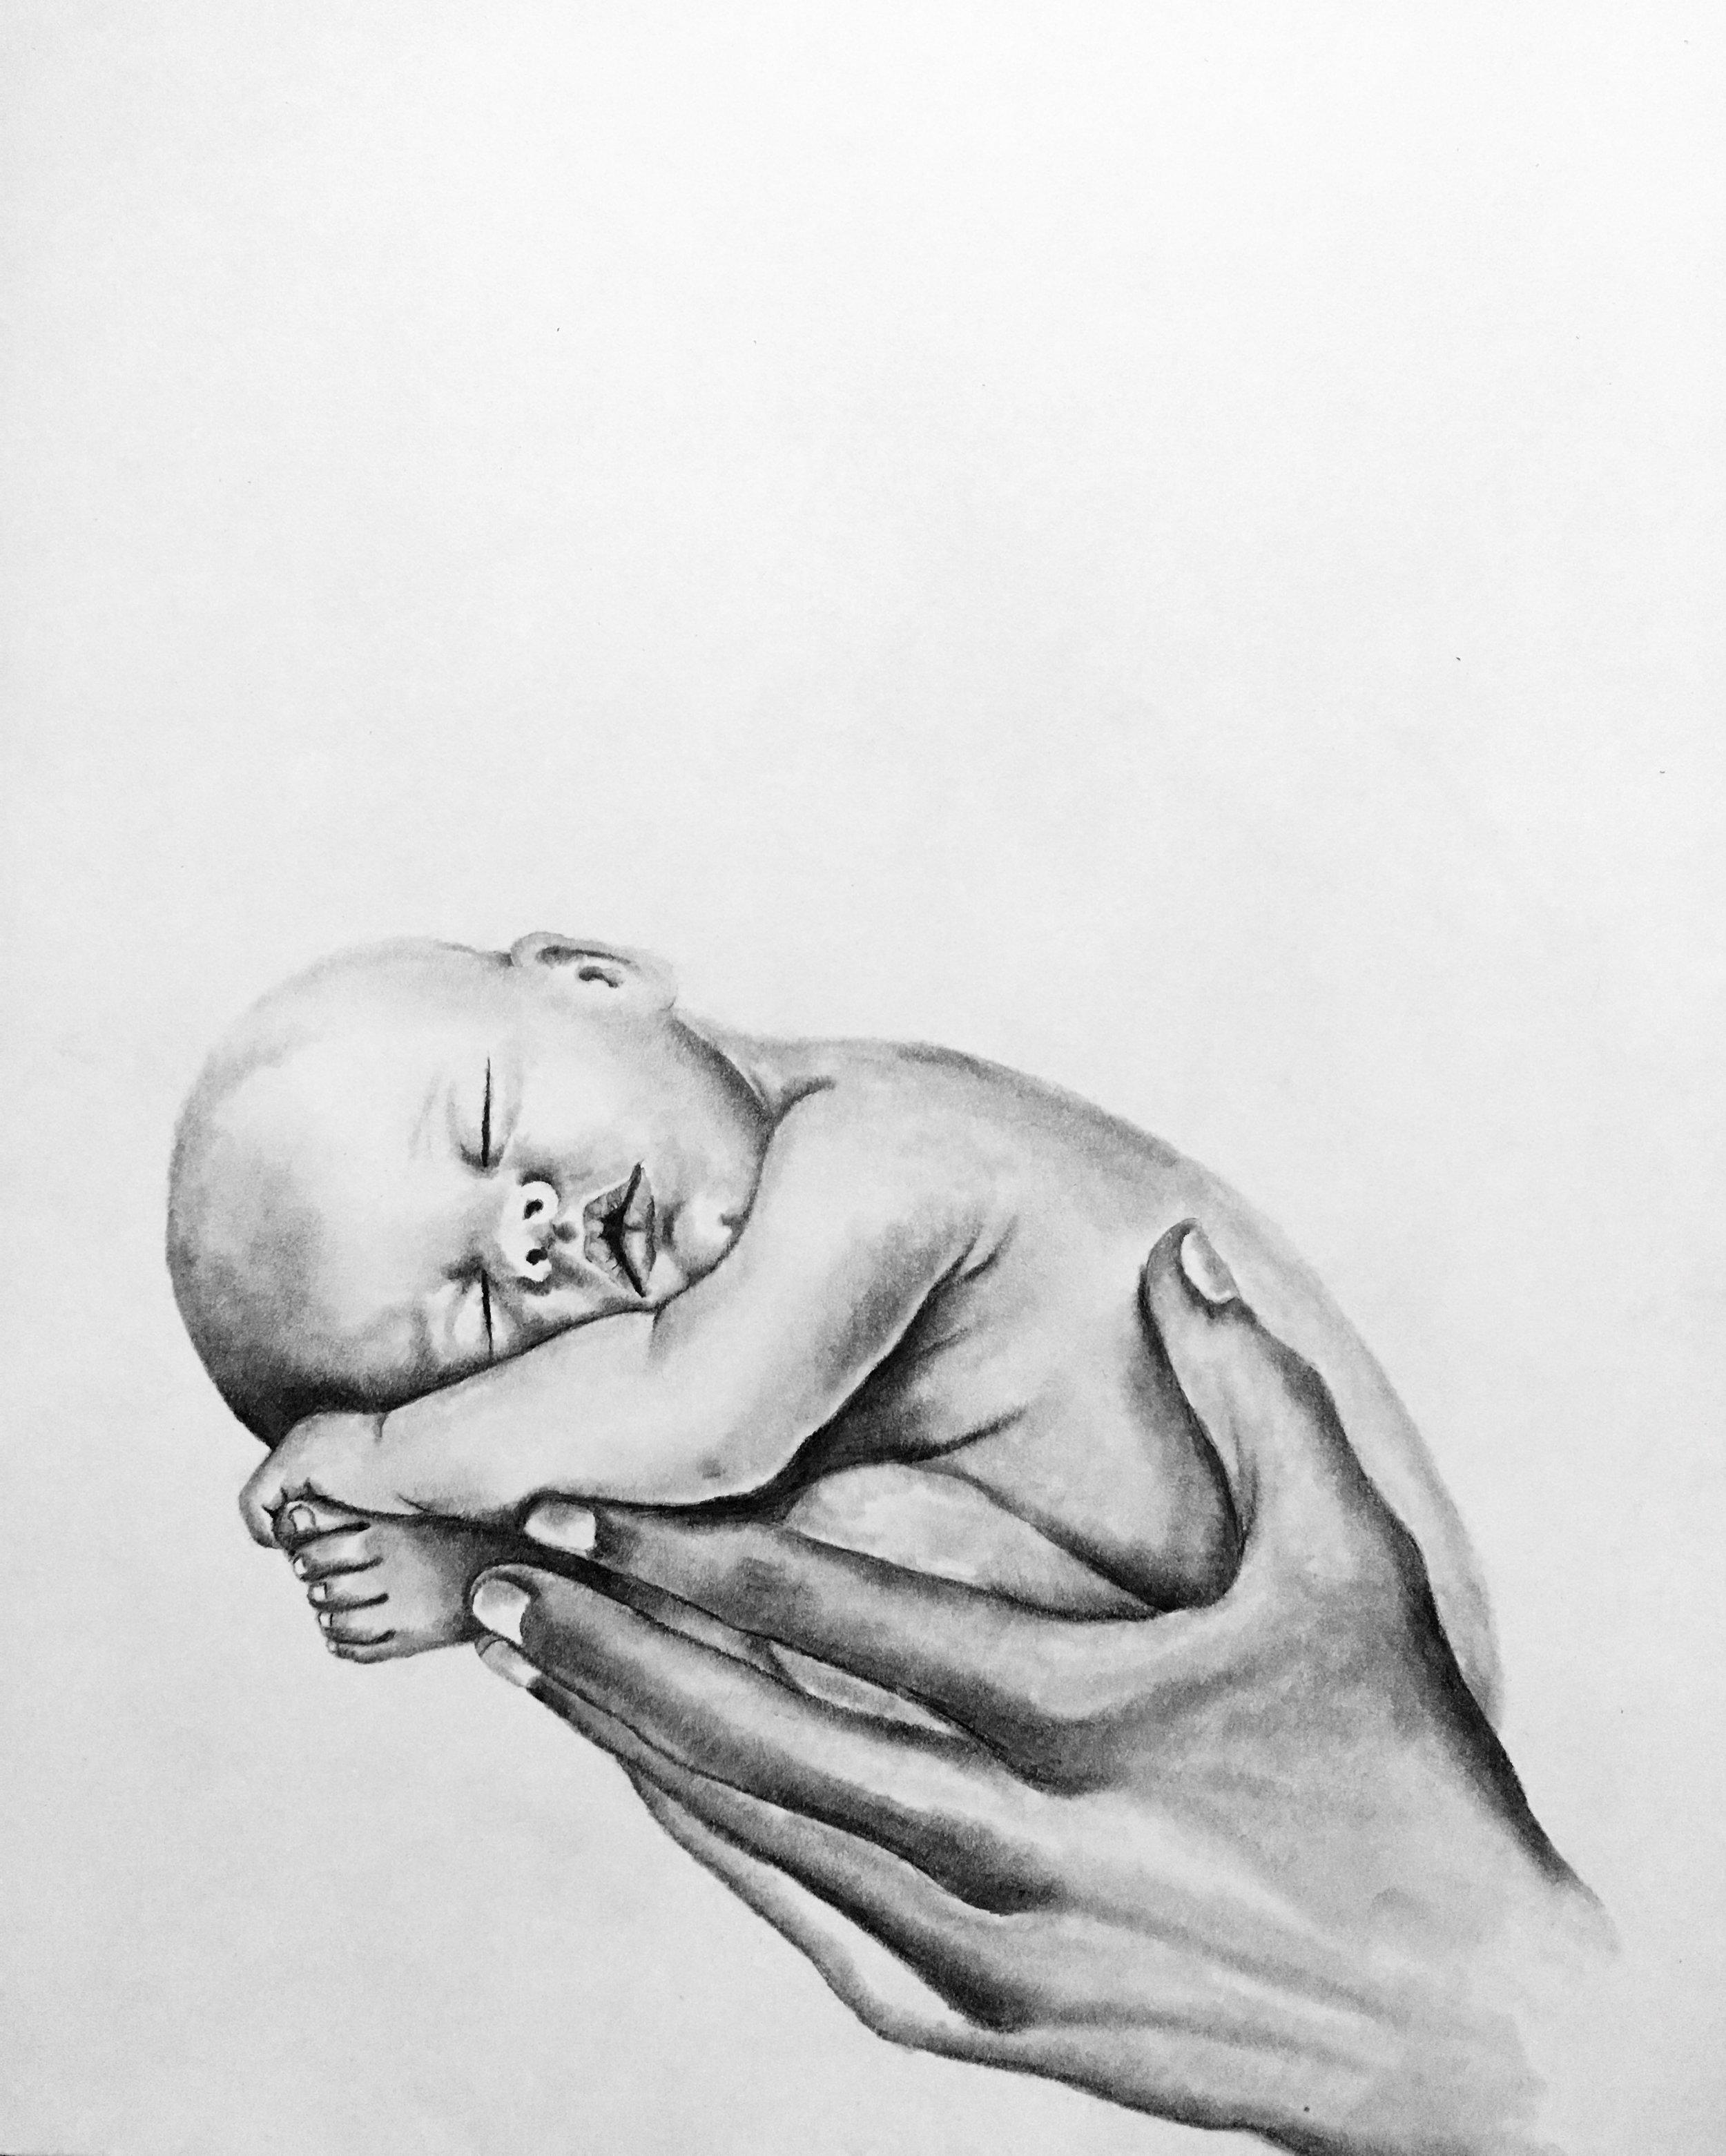 Newborn, 2018   #2 pencil & charcoal on paper